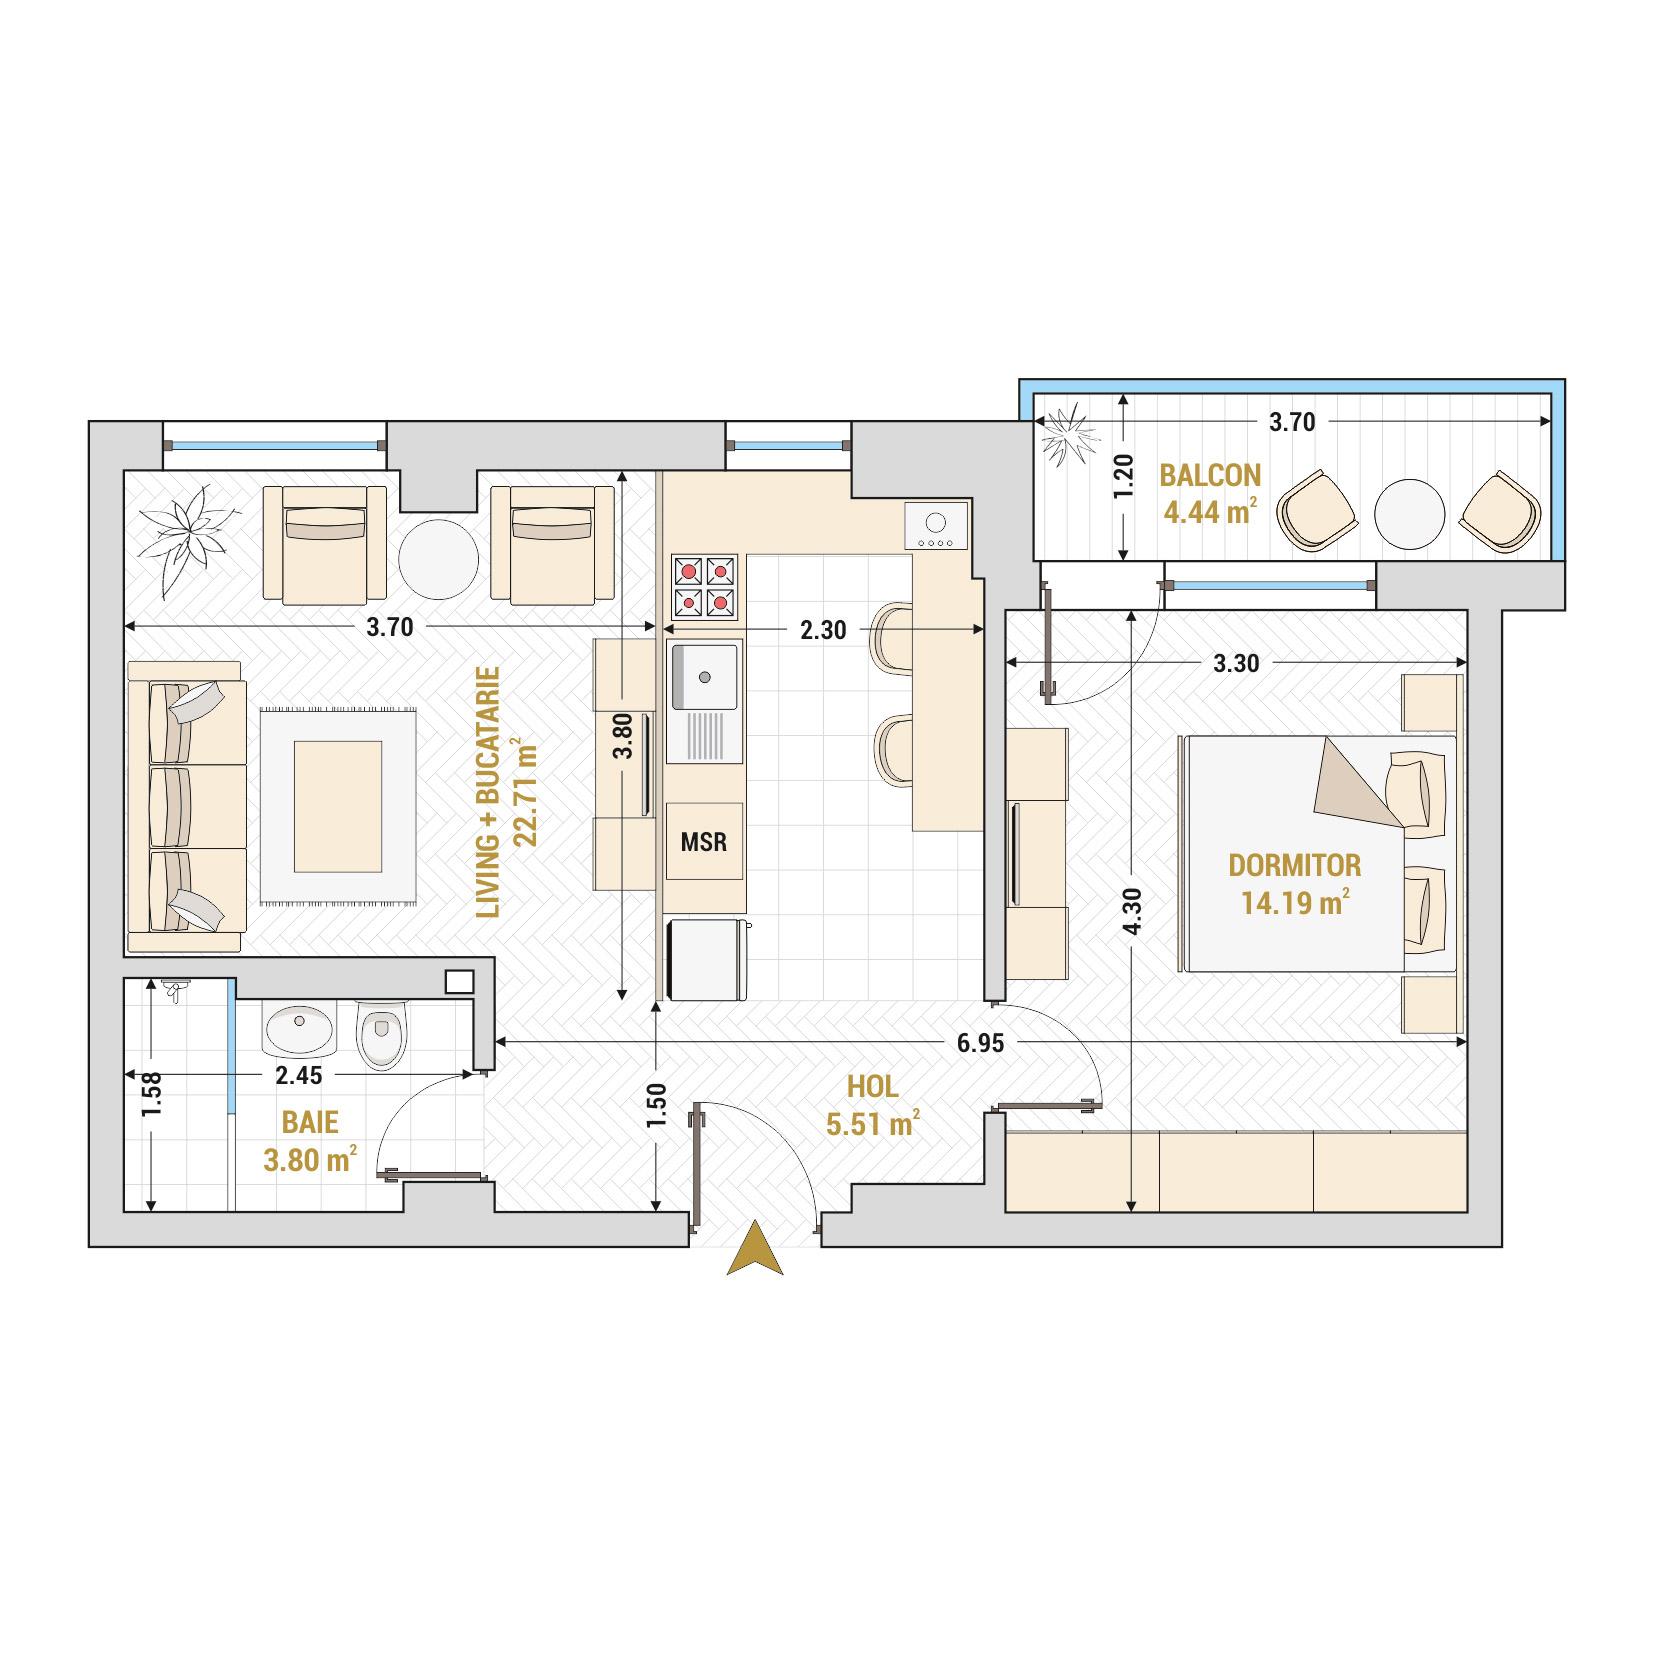 Apartamente cu 2 camere de vanzare Bucuresti - Catedral Residence - Marriott, Piata Unirii, 13 Septembrie, Izvor - Tip 3 - T1A